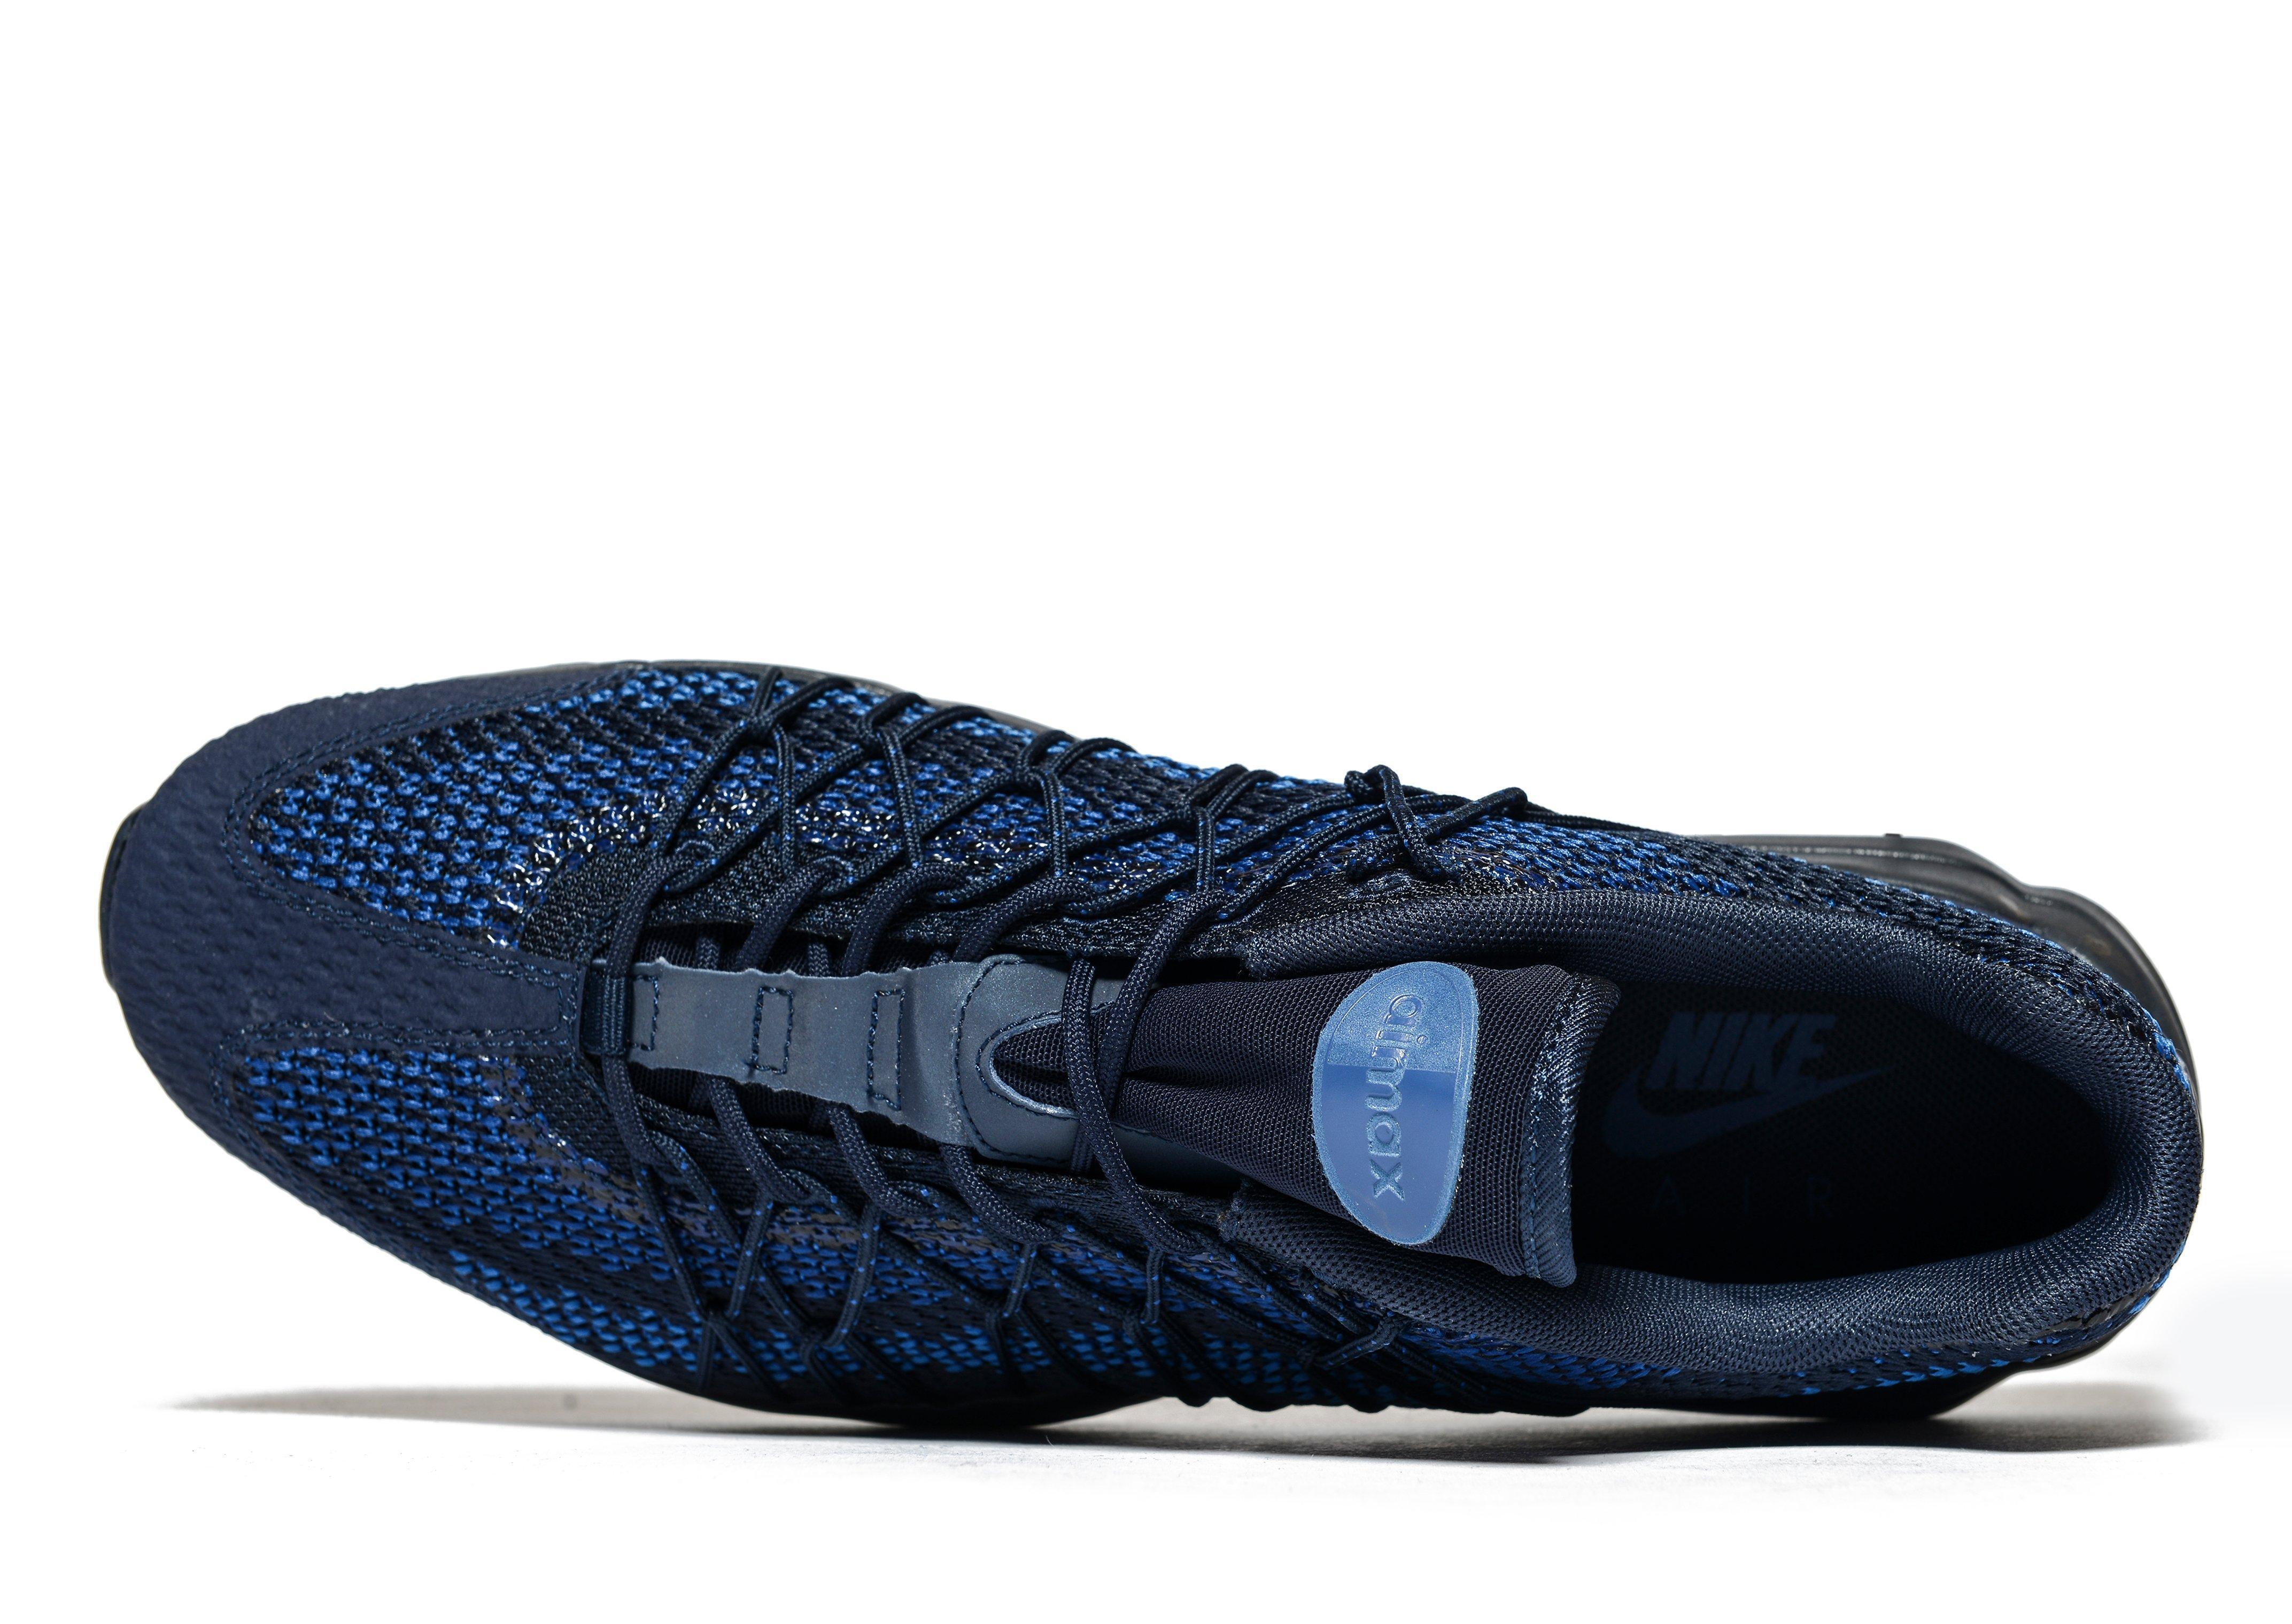 online store e9d06 86ec4 ... discount lyst nike air max 95 ultra jacquard in blue for men 30e4d 0db11